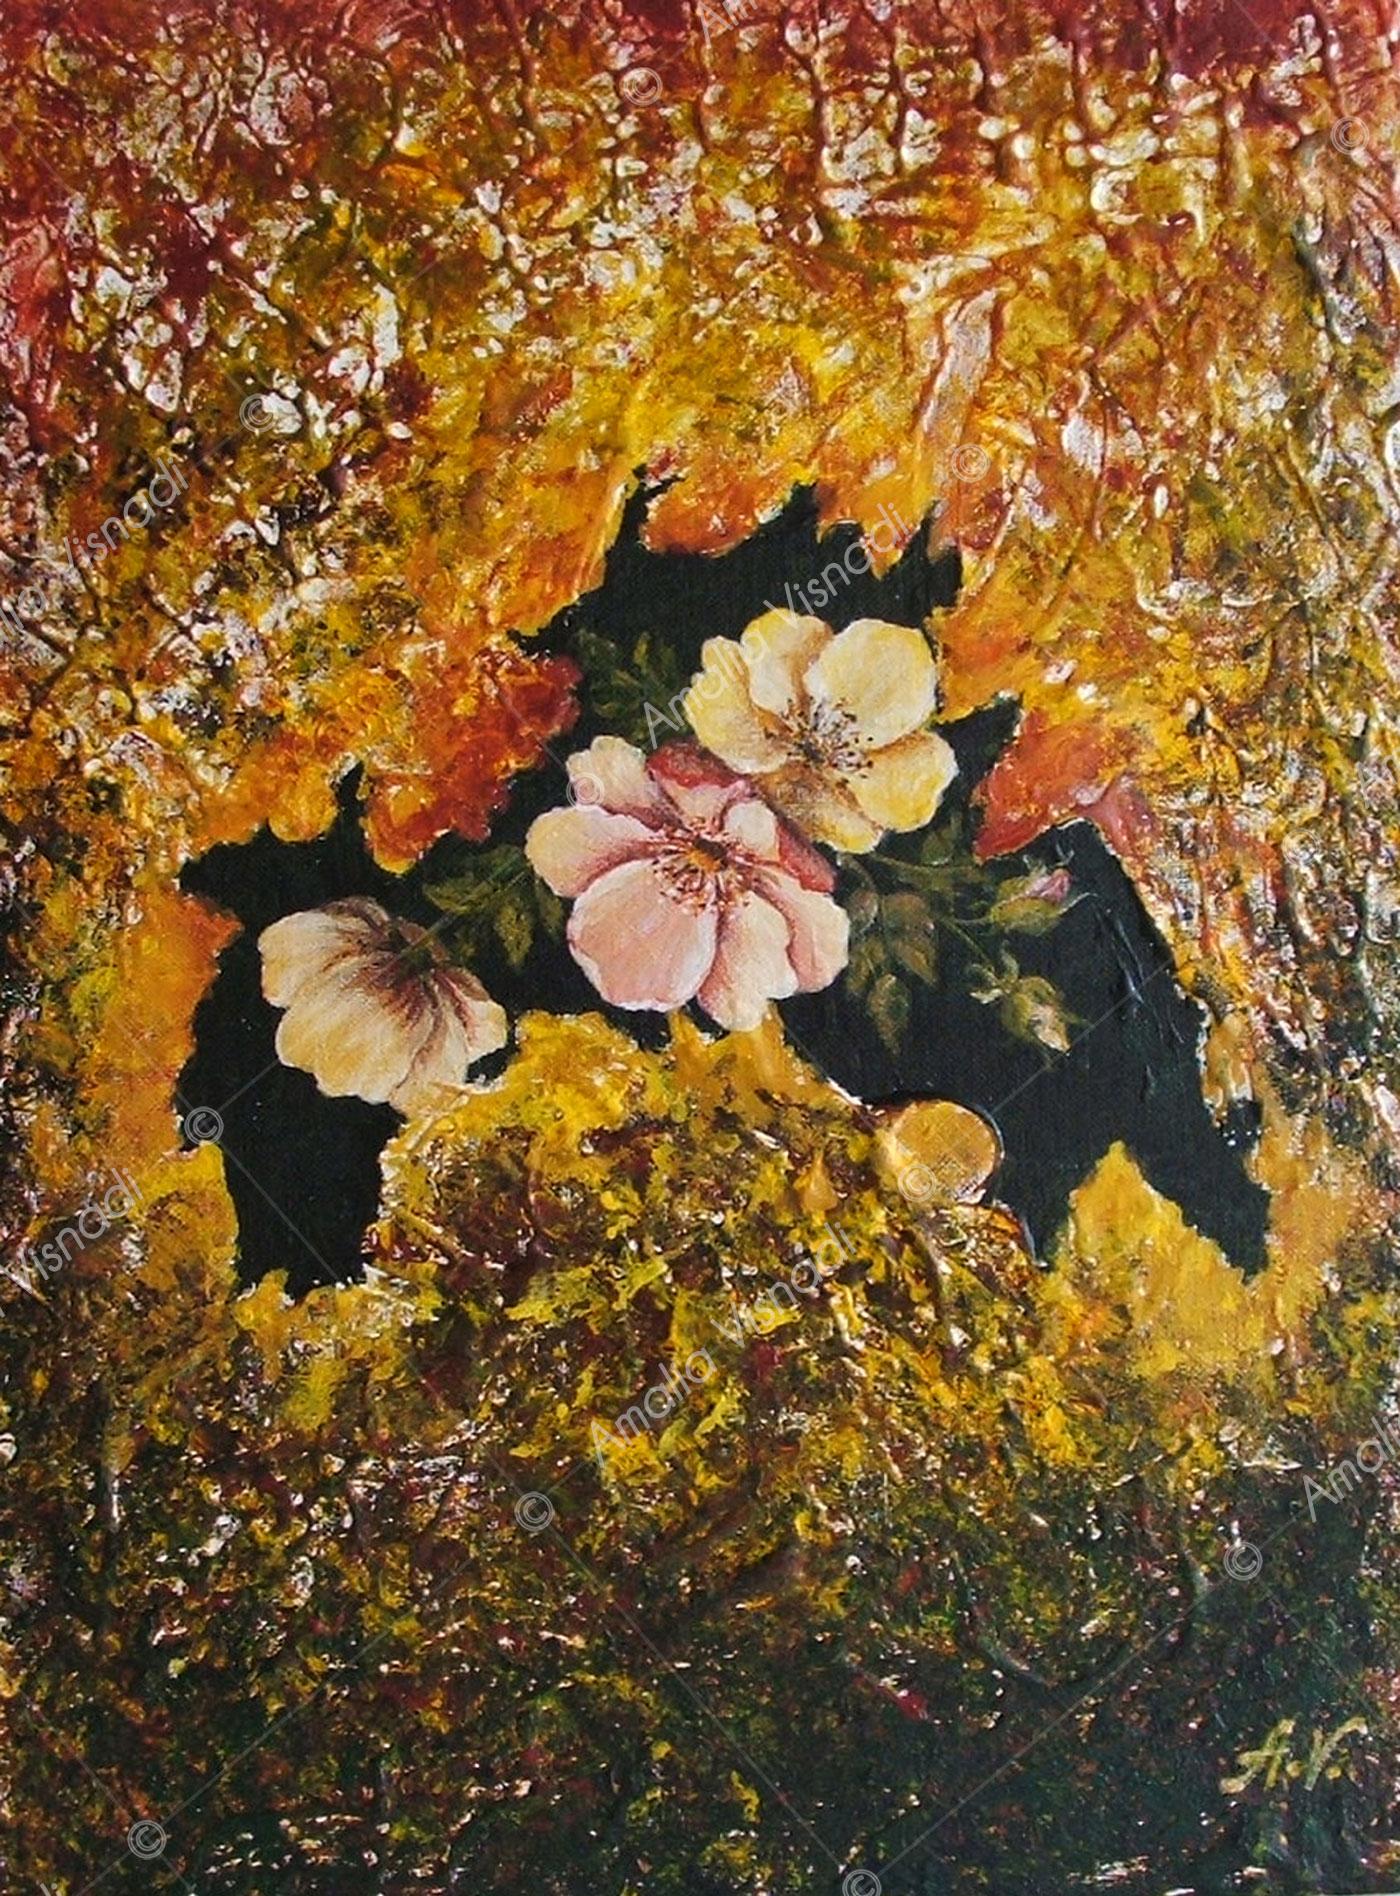 Roselline_Acrilico e olio su tela 35 x 45